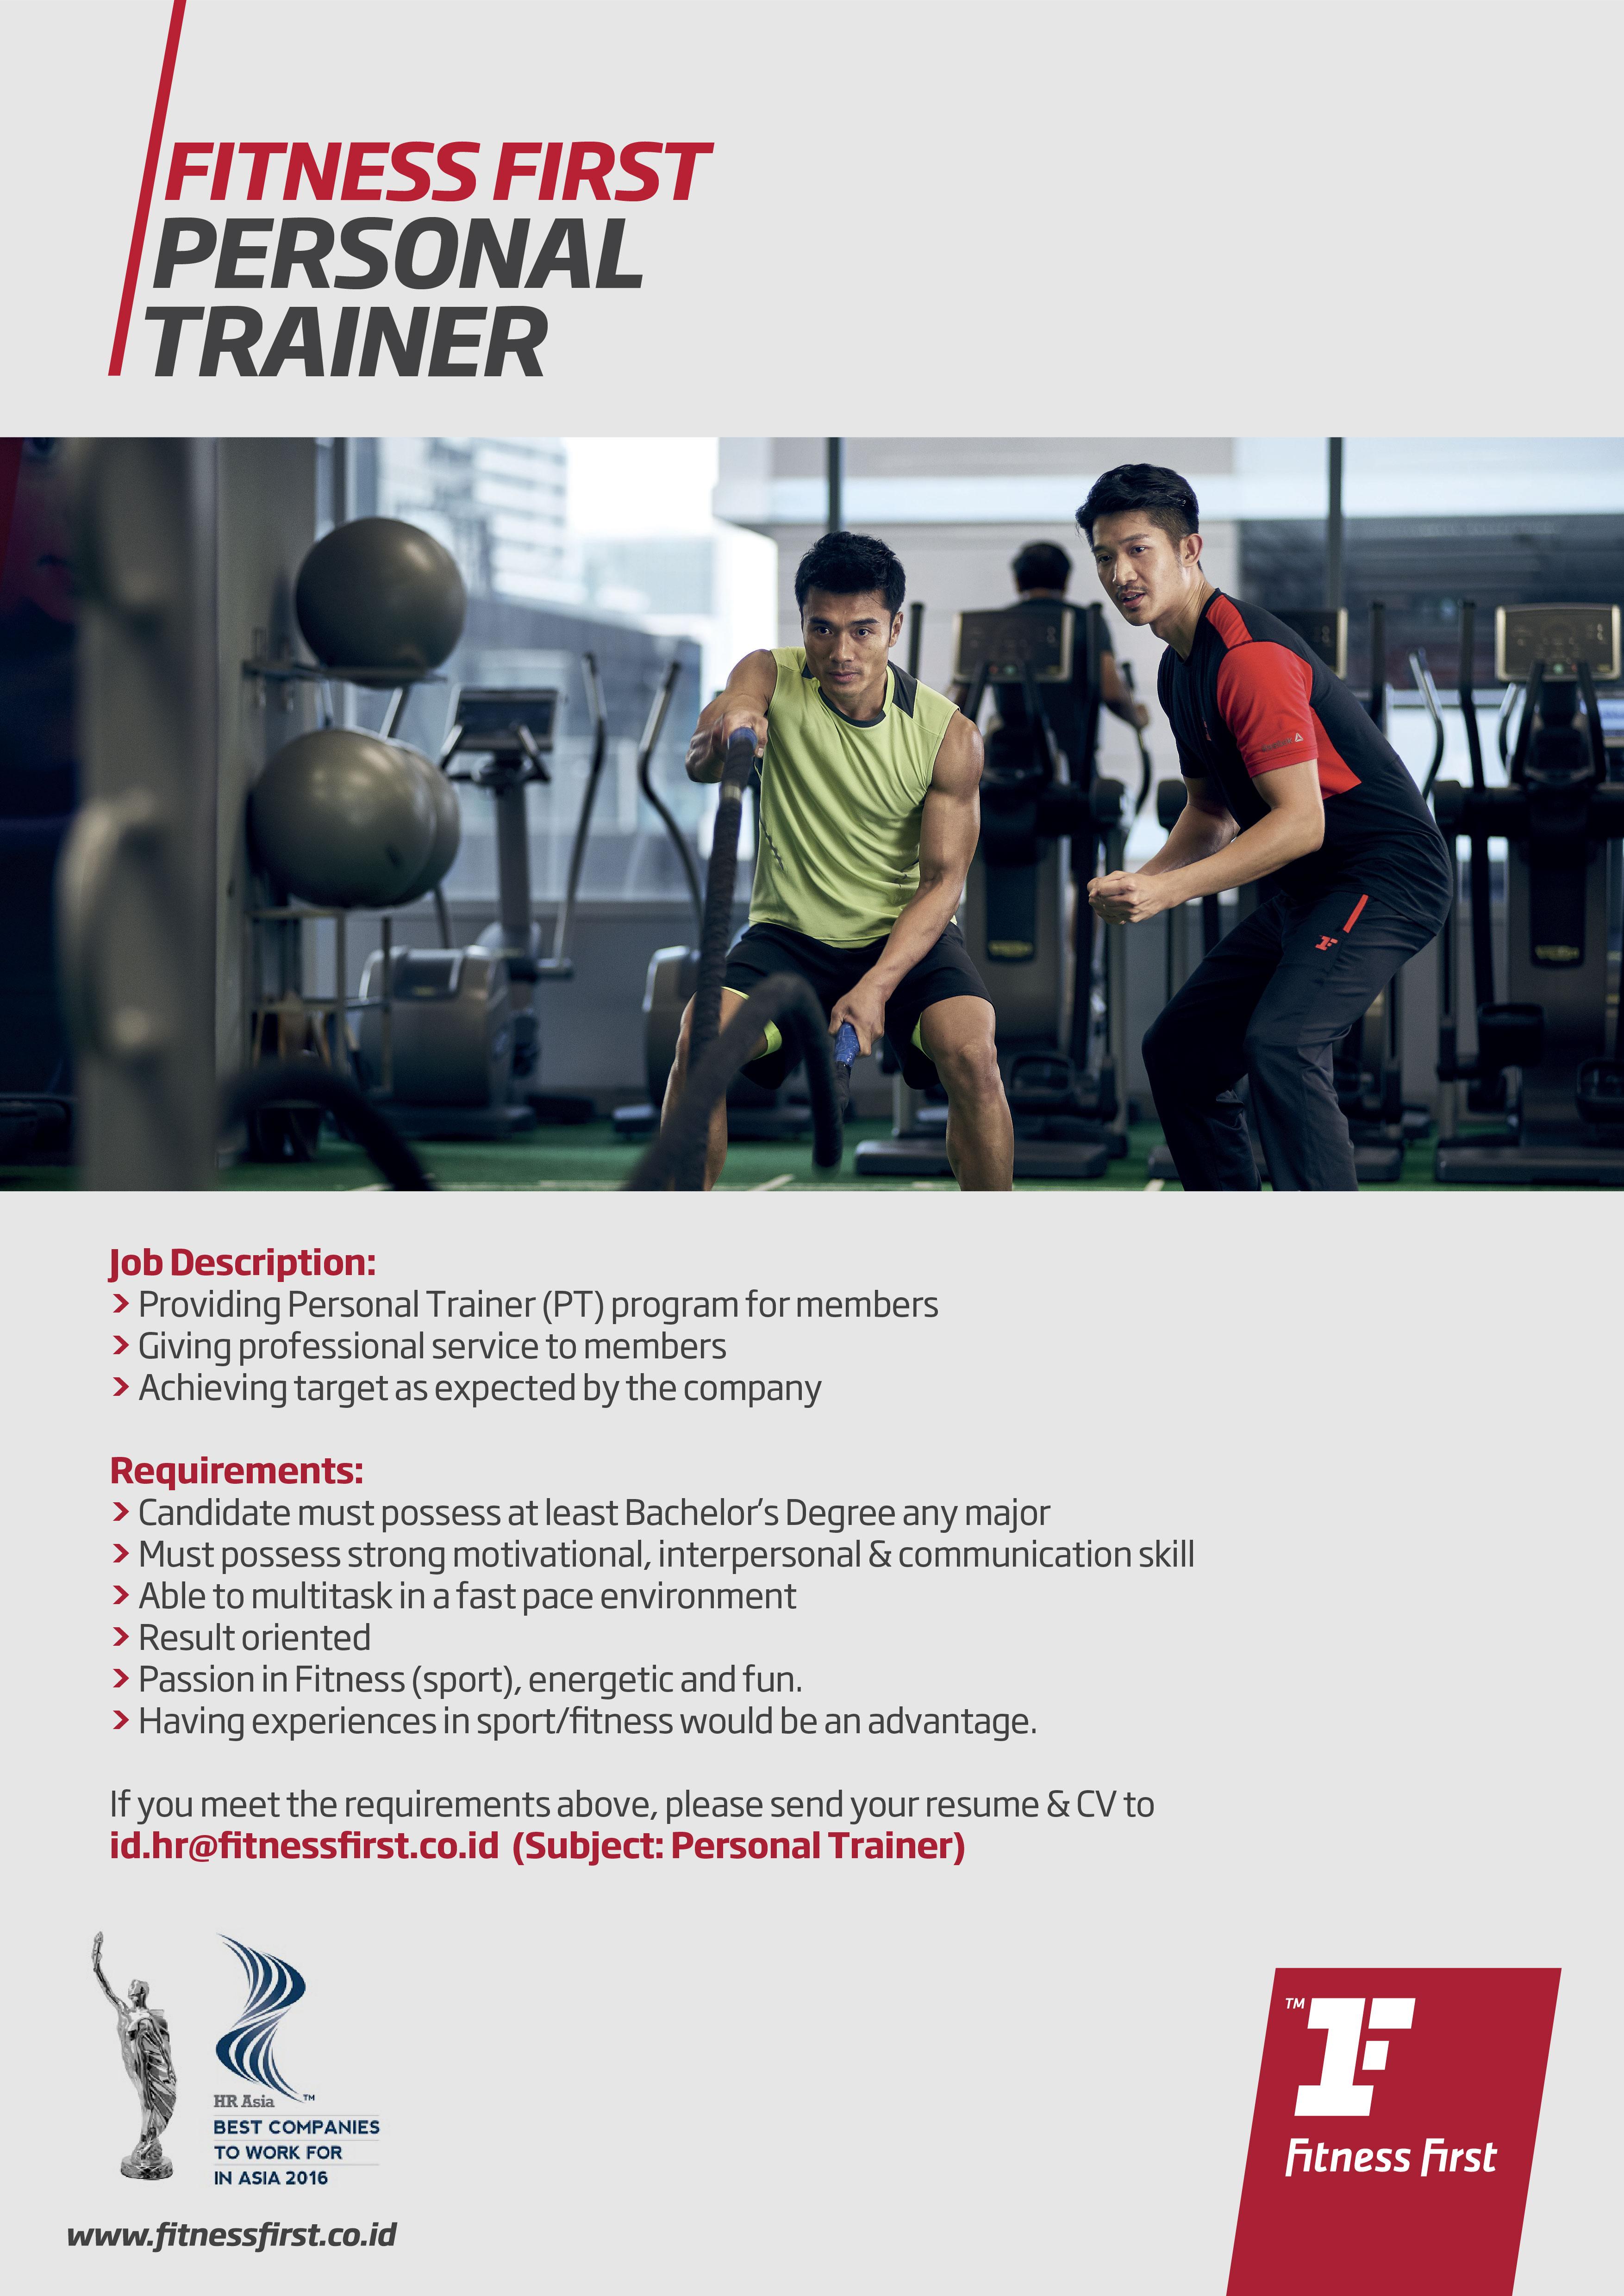 Lowongan Kerja Fitness First Indonesia